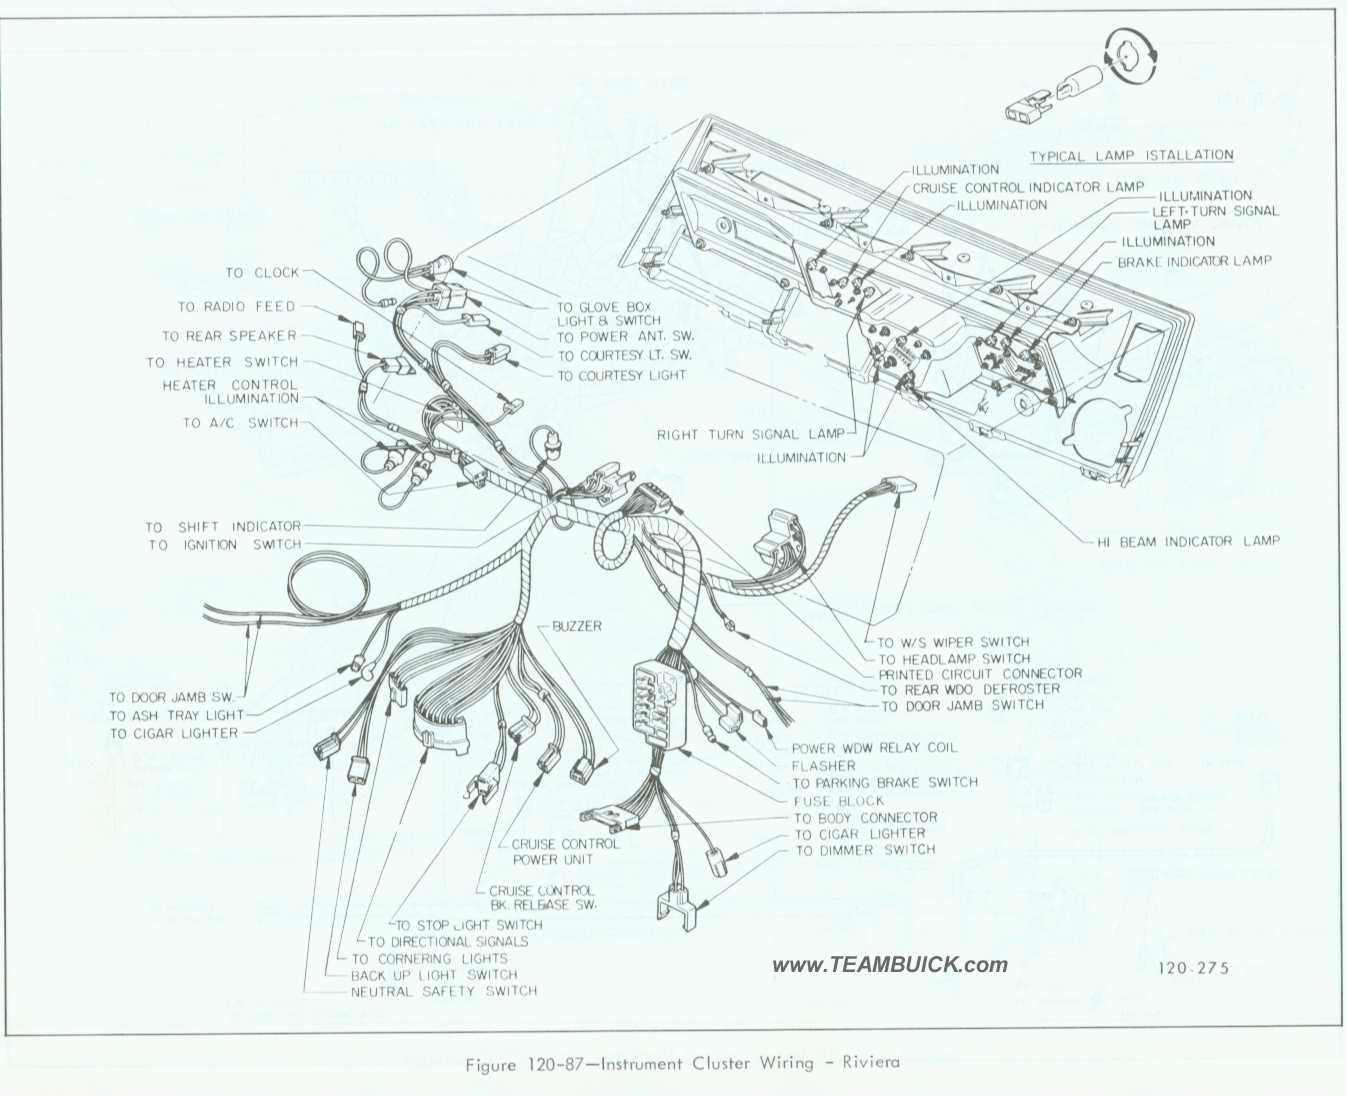 1967 Buick Riviera, Instrument Cluster Wiring